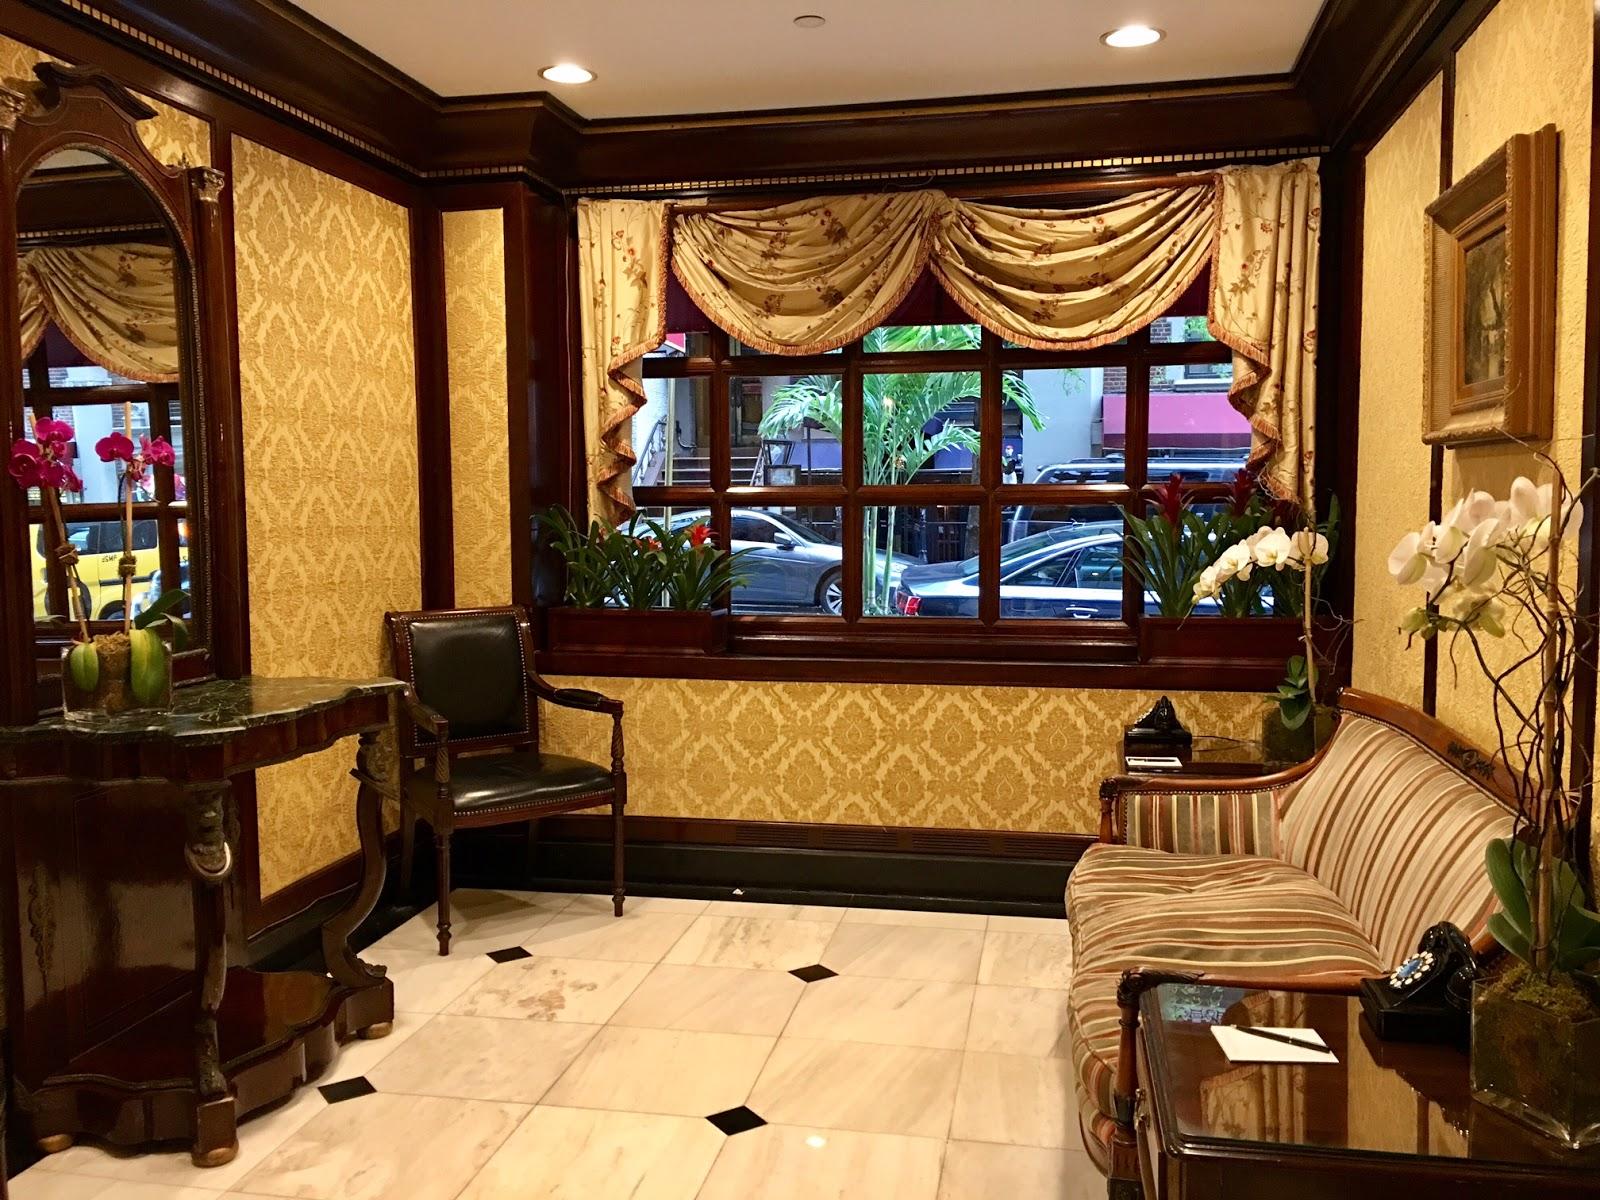 Hotel Elysee Lobby